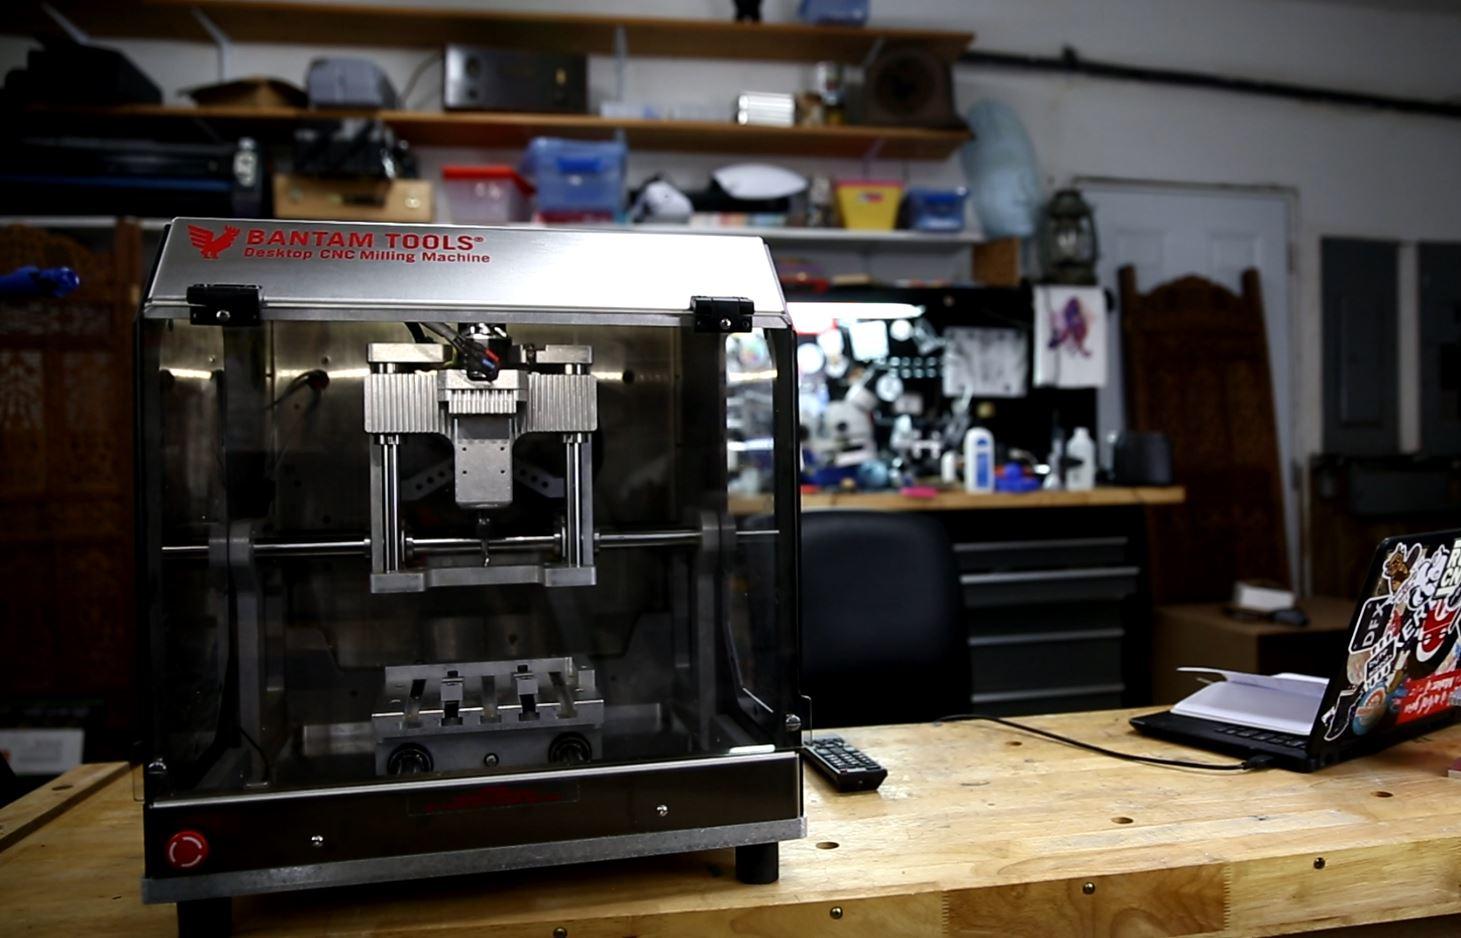 First Impressions of The Bantam Desktop CNC Mill